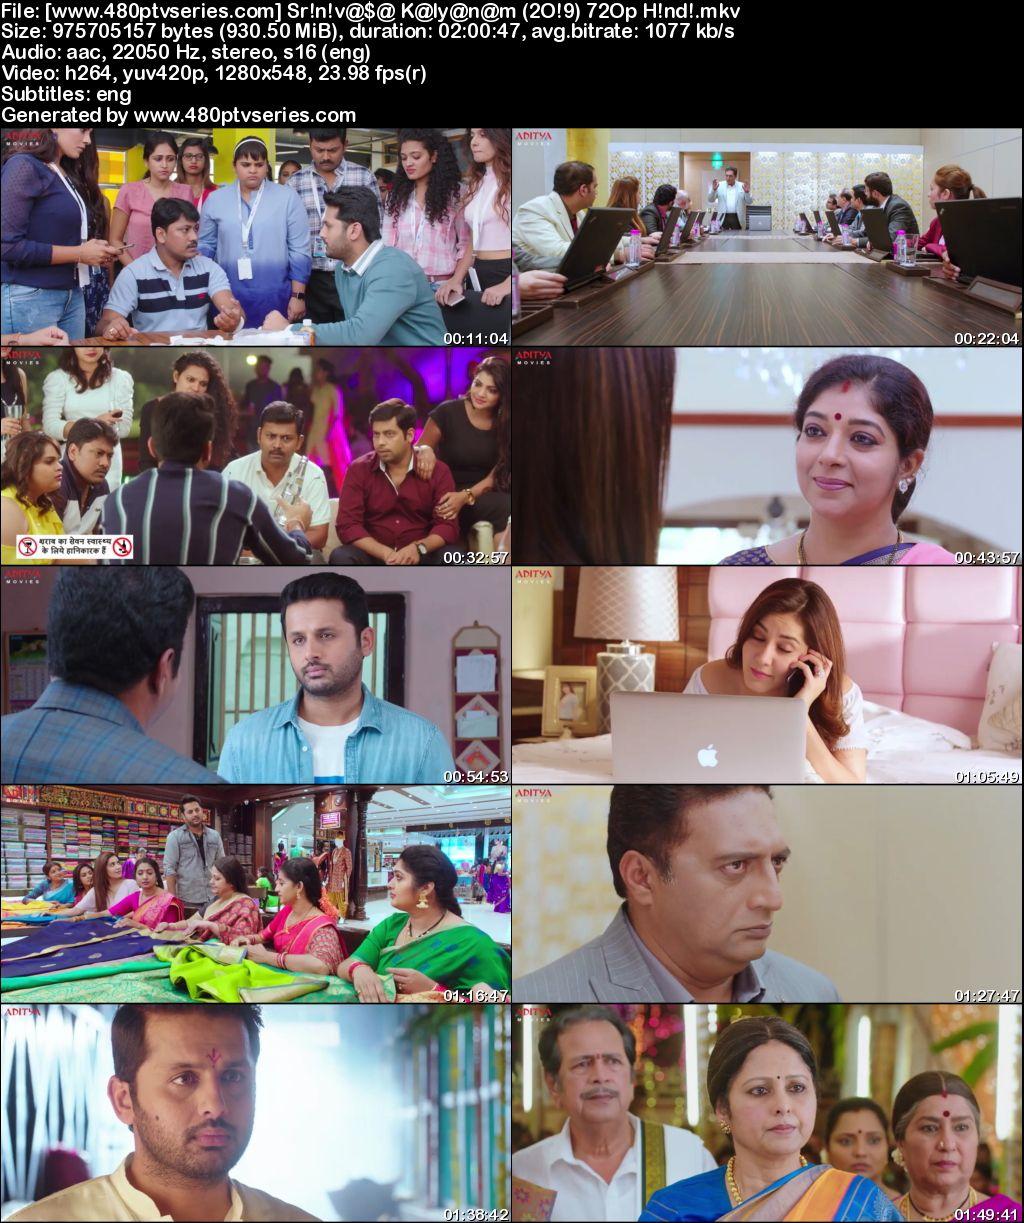 Download Srinivasa Kalyanam (2019) 900MB Full Hindi Dubbed Movie Download 720p HDRip Free Watch Online Full Movie Download Worldfree4u 9xmovies